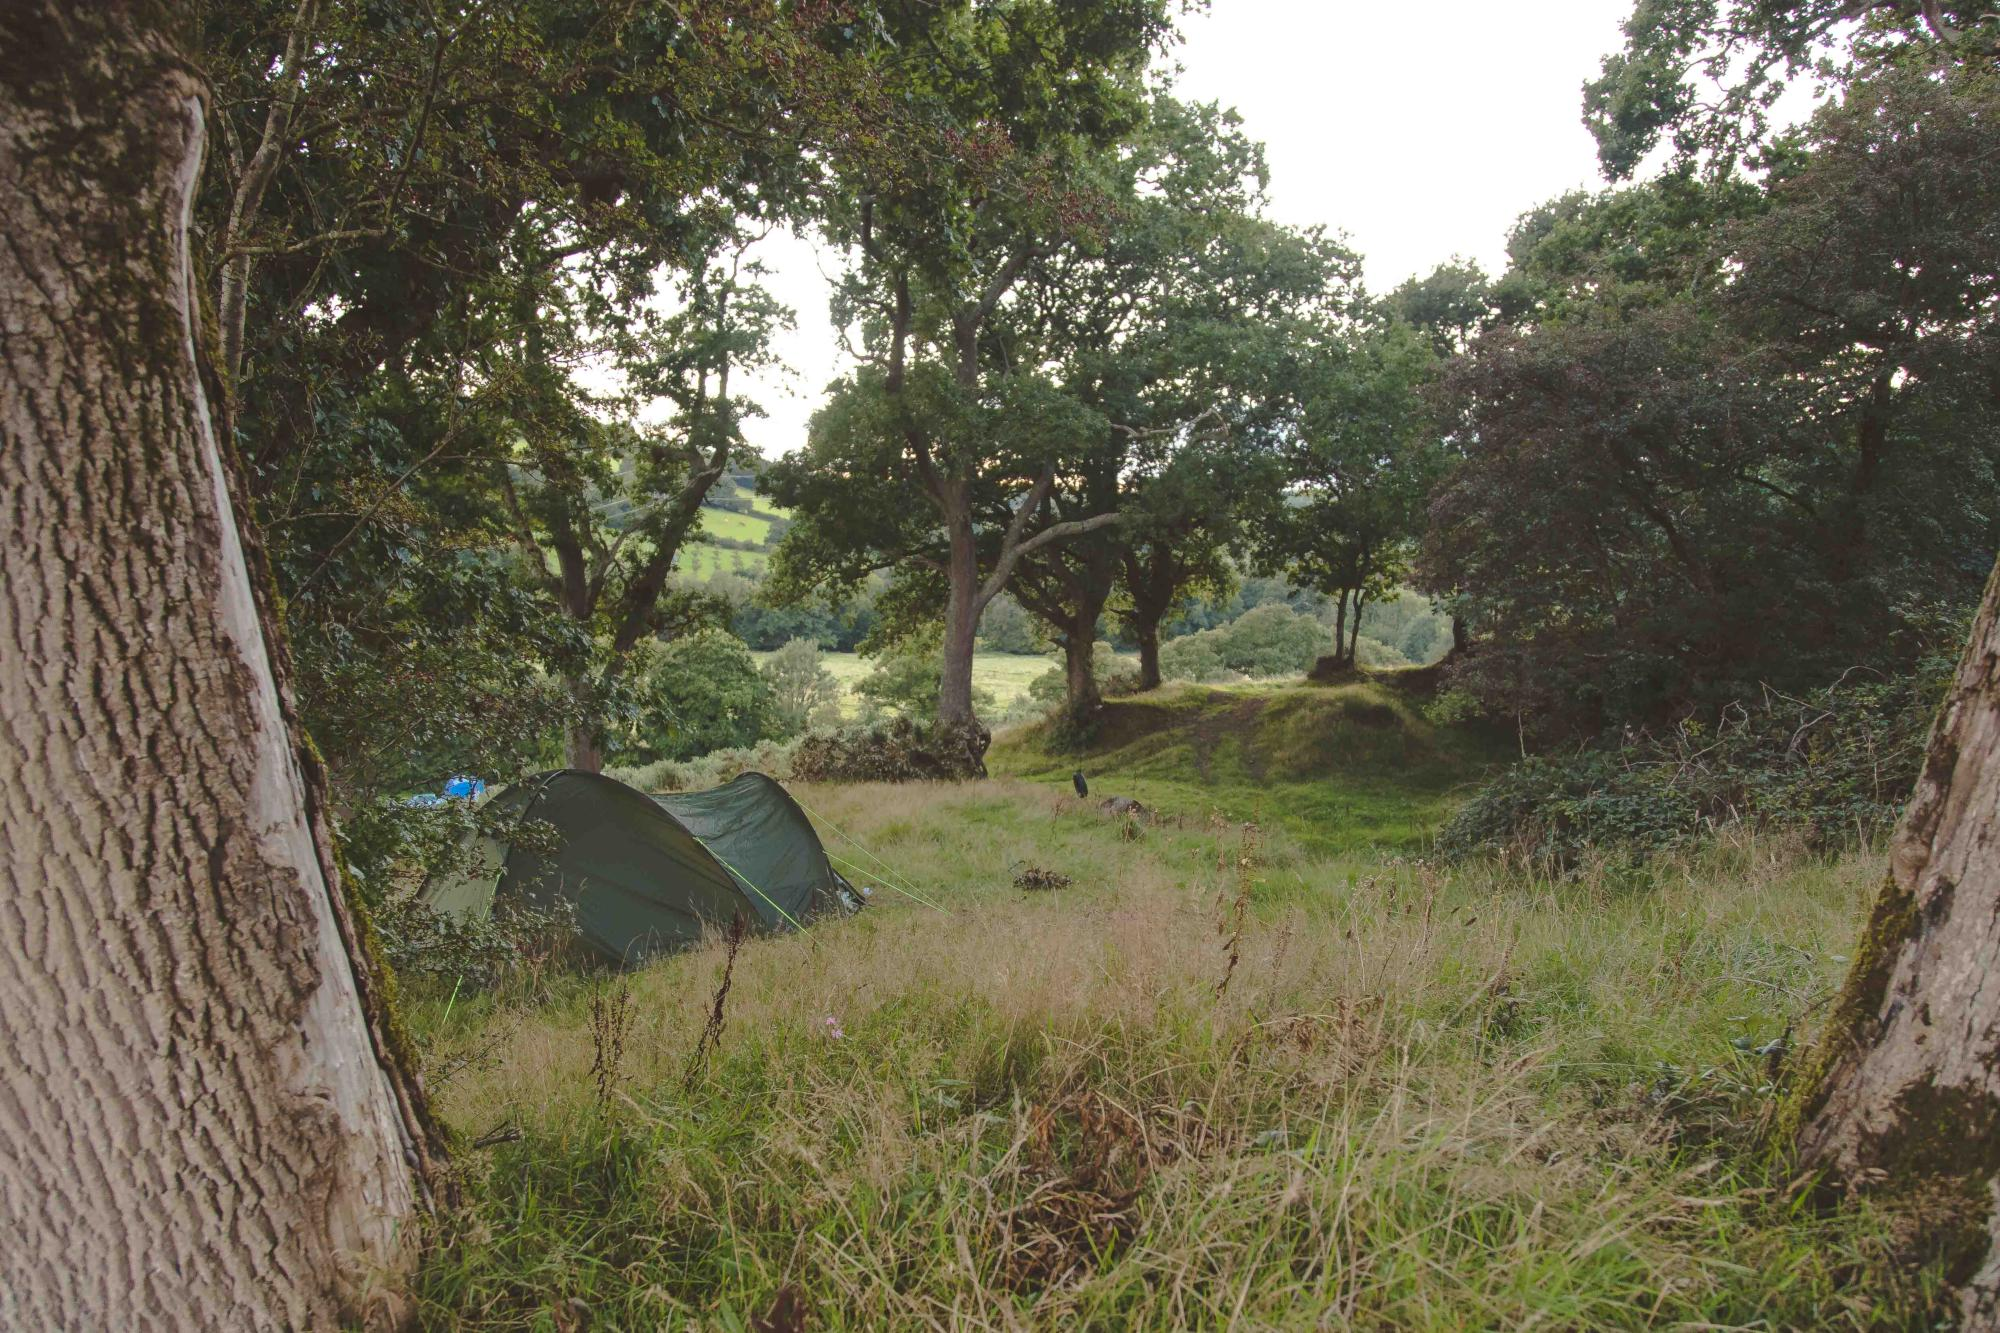 Campsites in Cornwall – I Love This Campsite